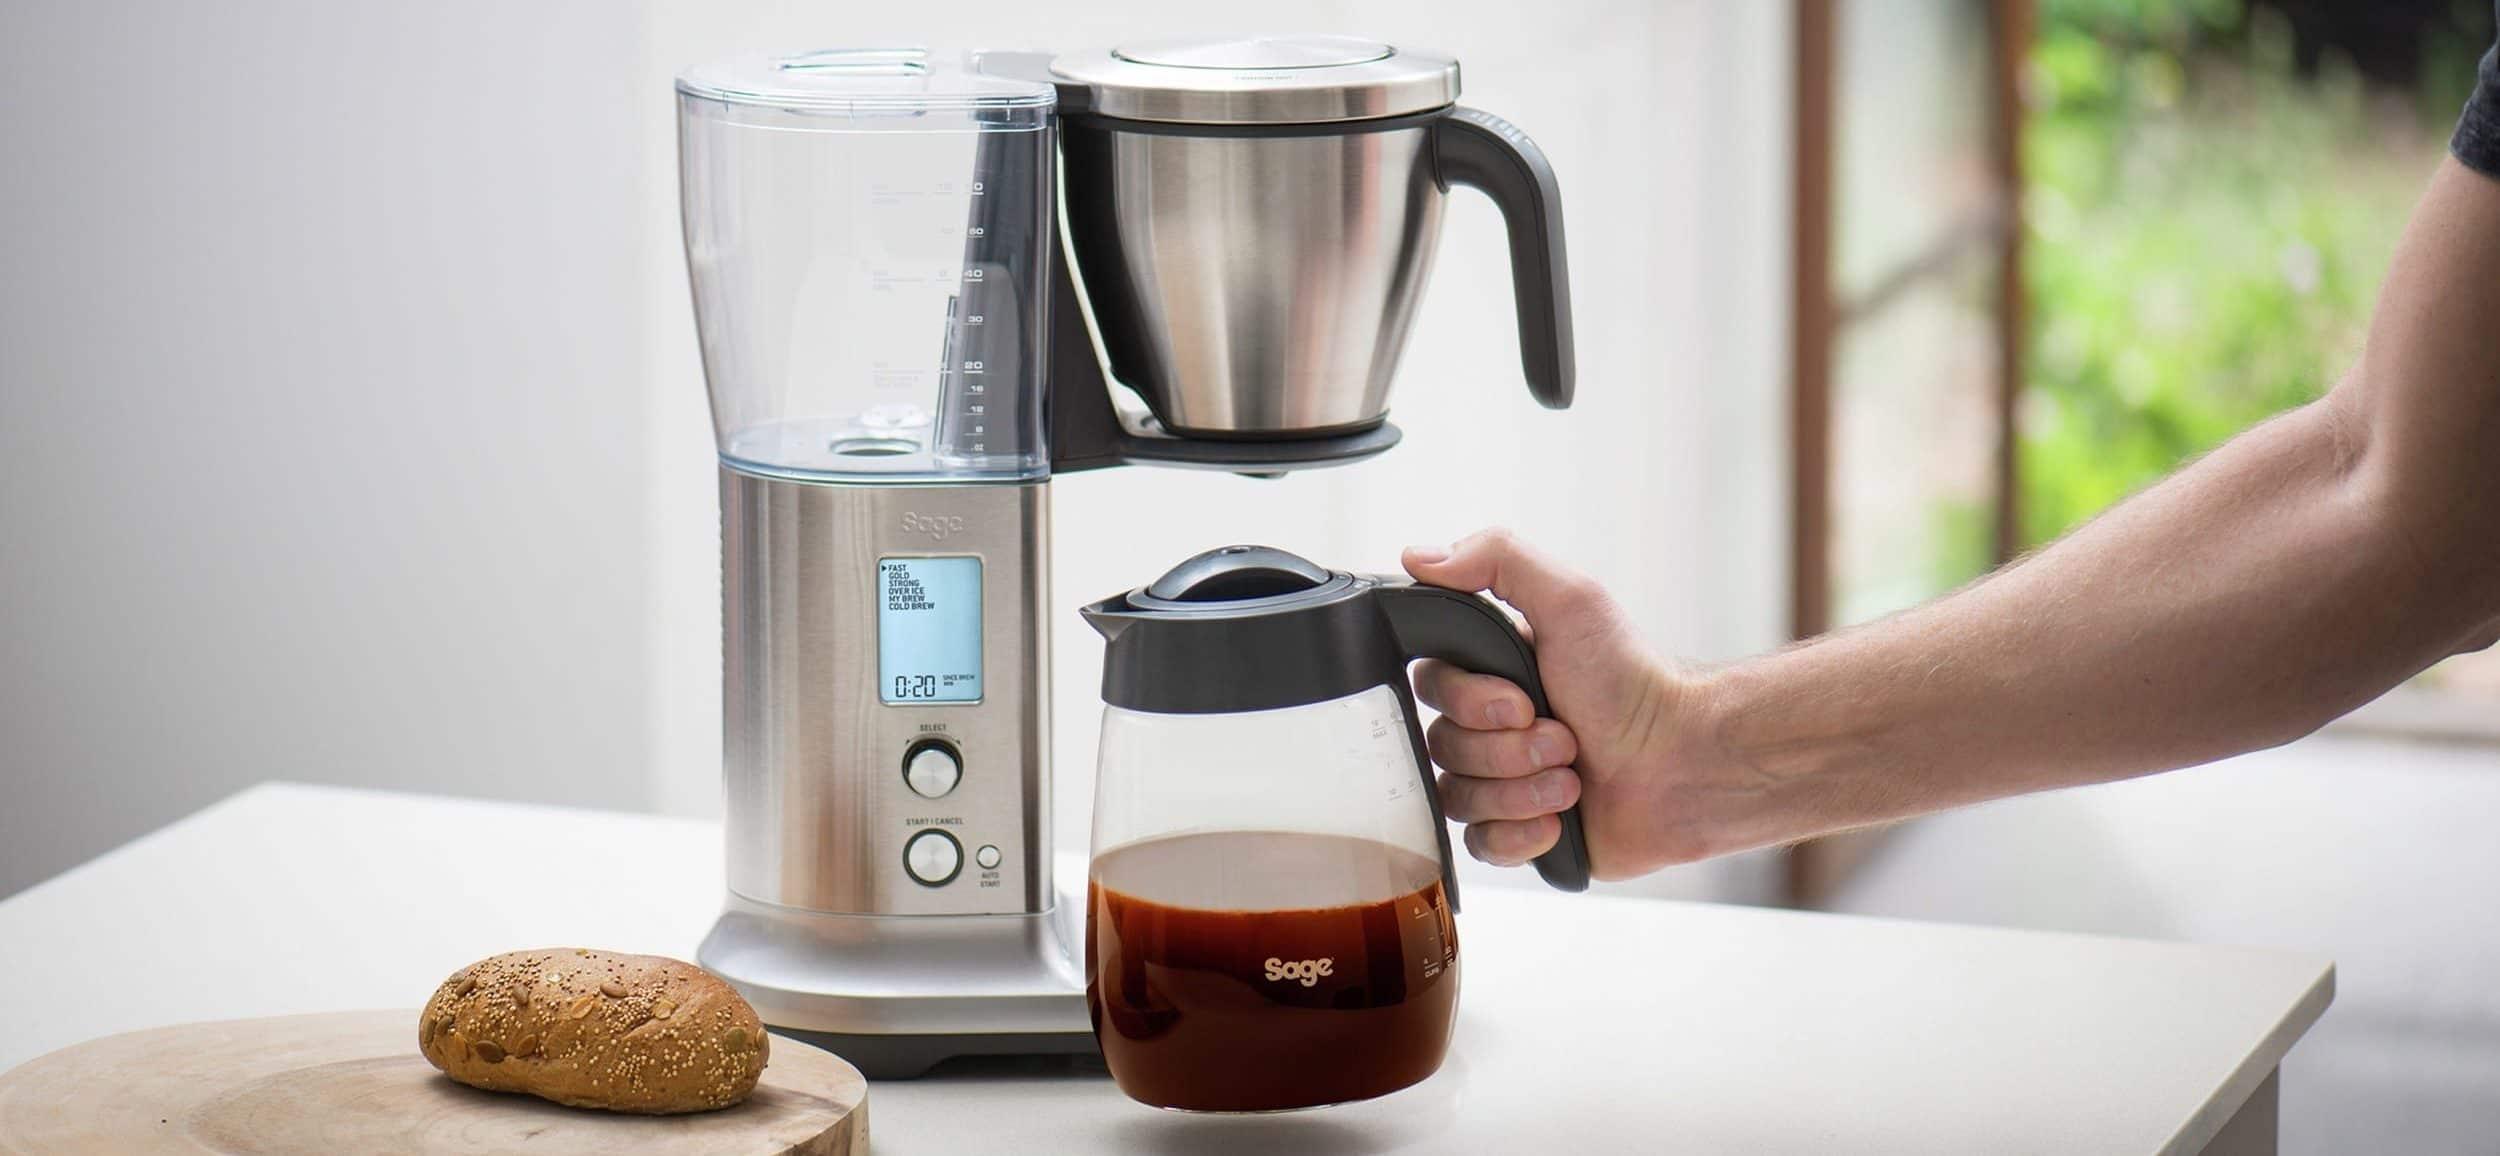 Best Drip Coffee Makers [Jun. 2020] – Detailed Reviews